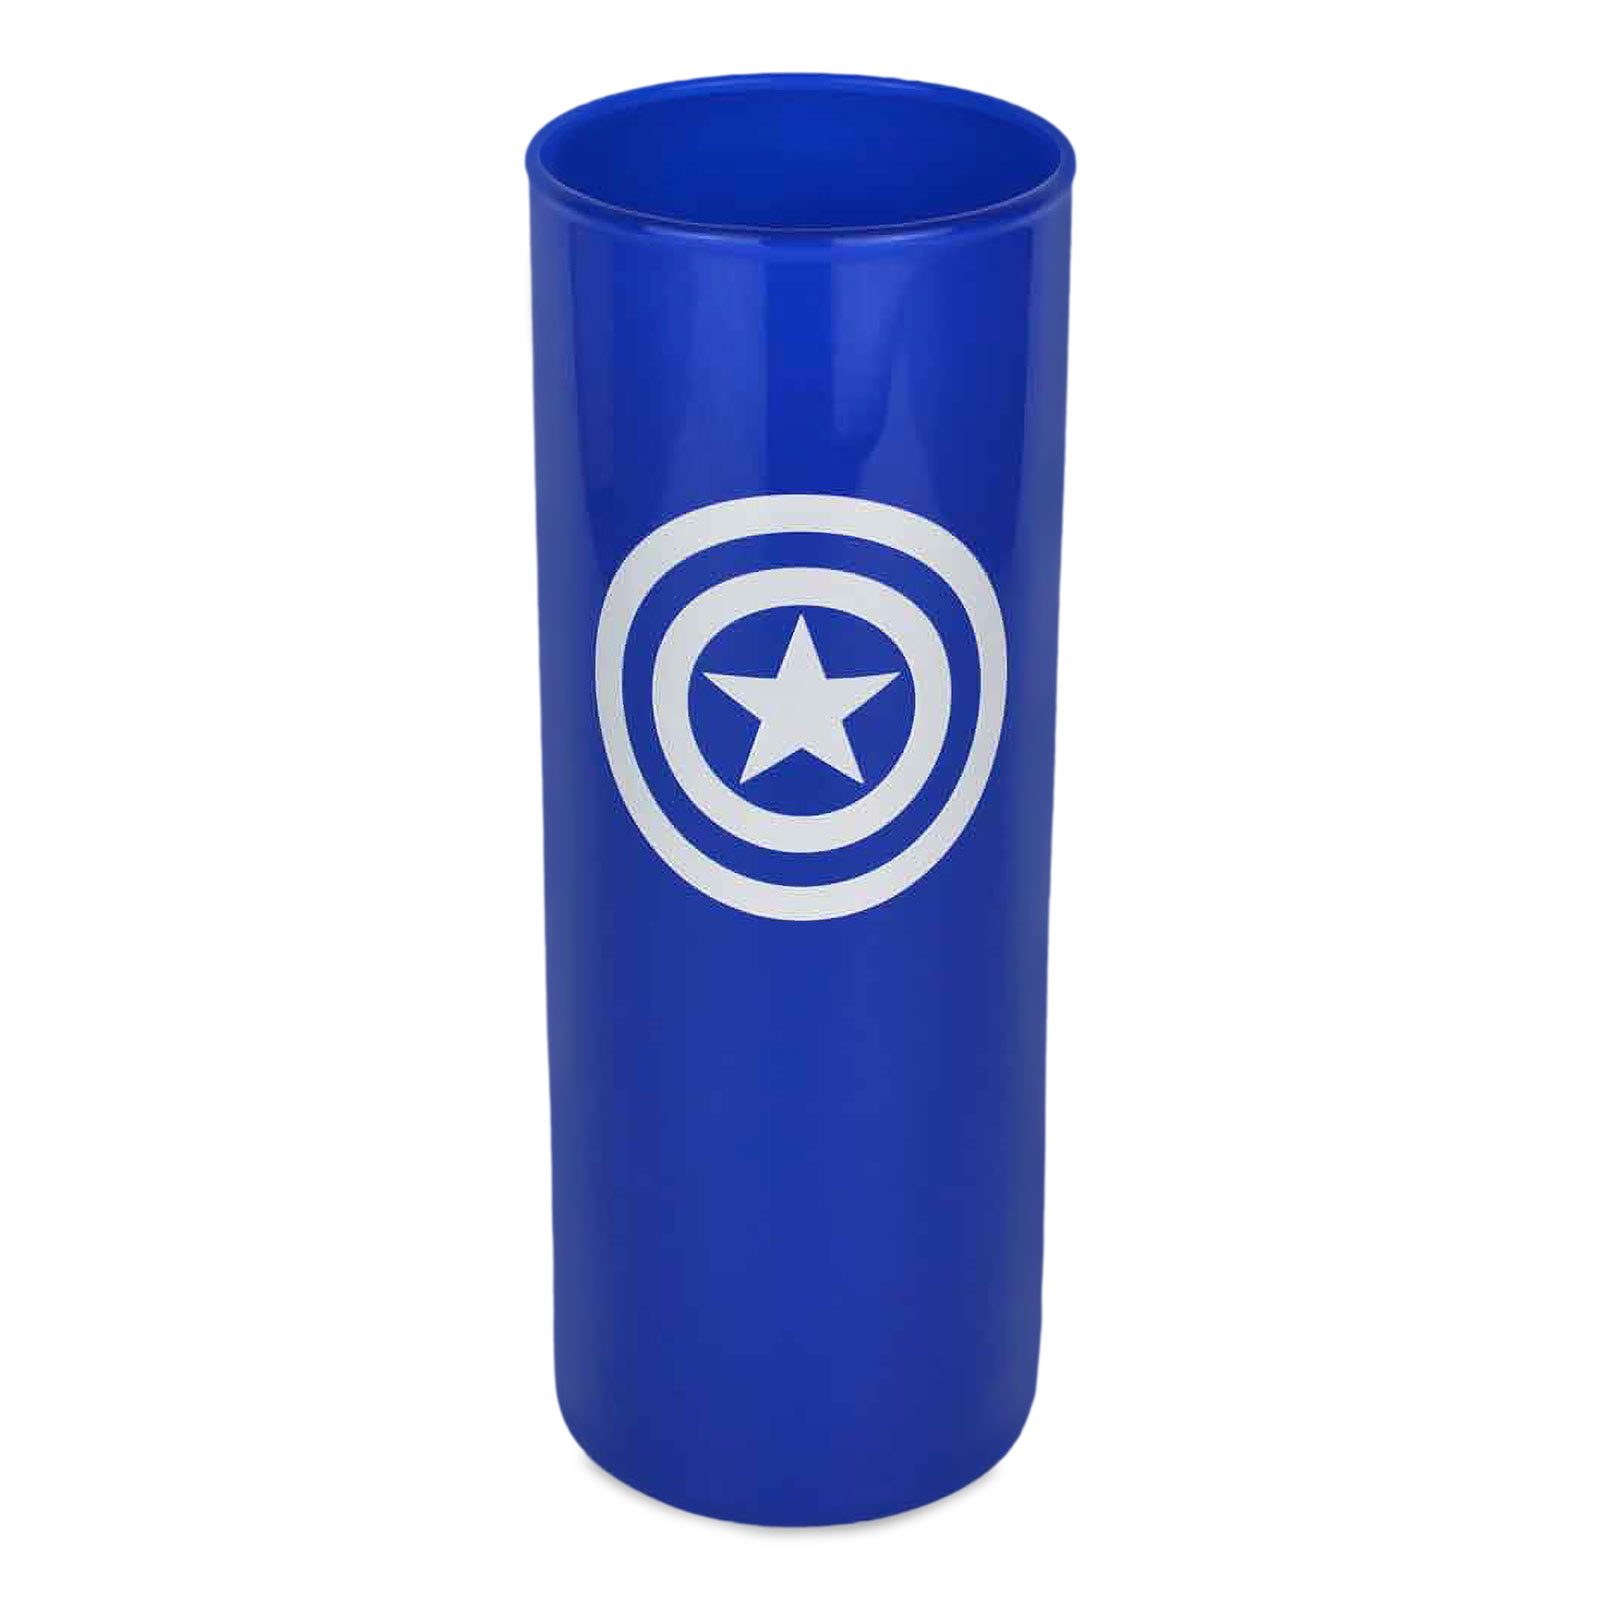 Captain America - Shield Logo Glas blau